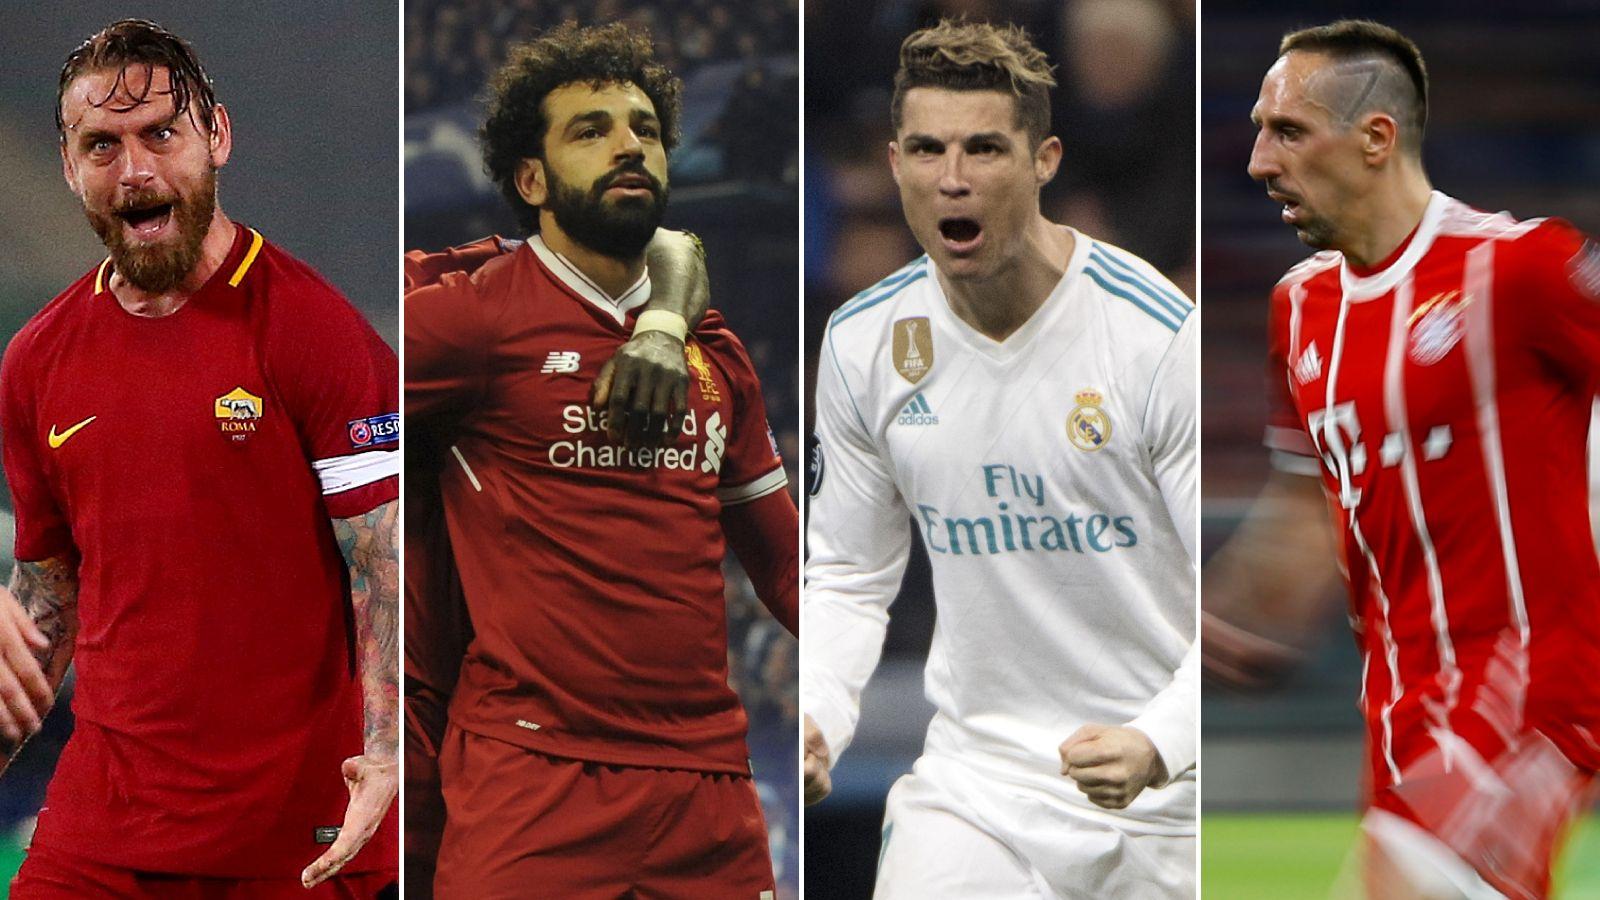 SEMIFINALEKLARE: Romas Daniele de Rossi, Liverpools Mohamed Salah, Real Madrids Cristiano Ronaldo og Bayern Münchens Franck Ribery.